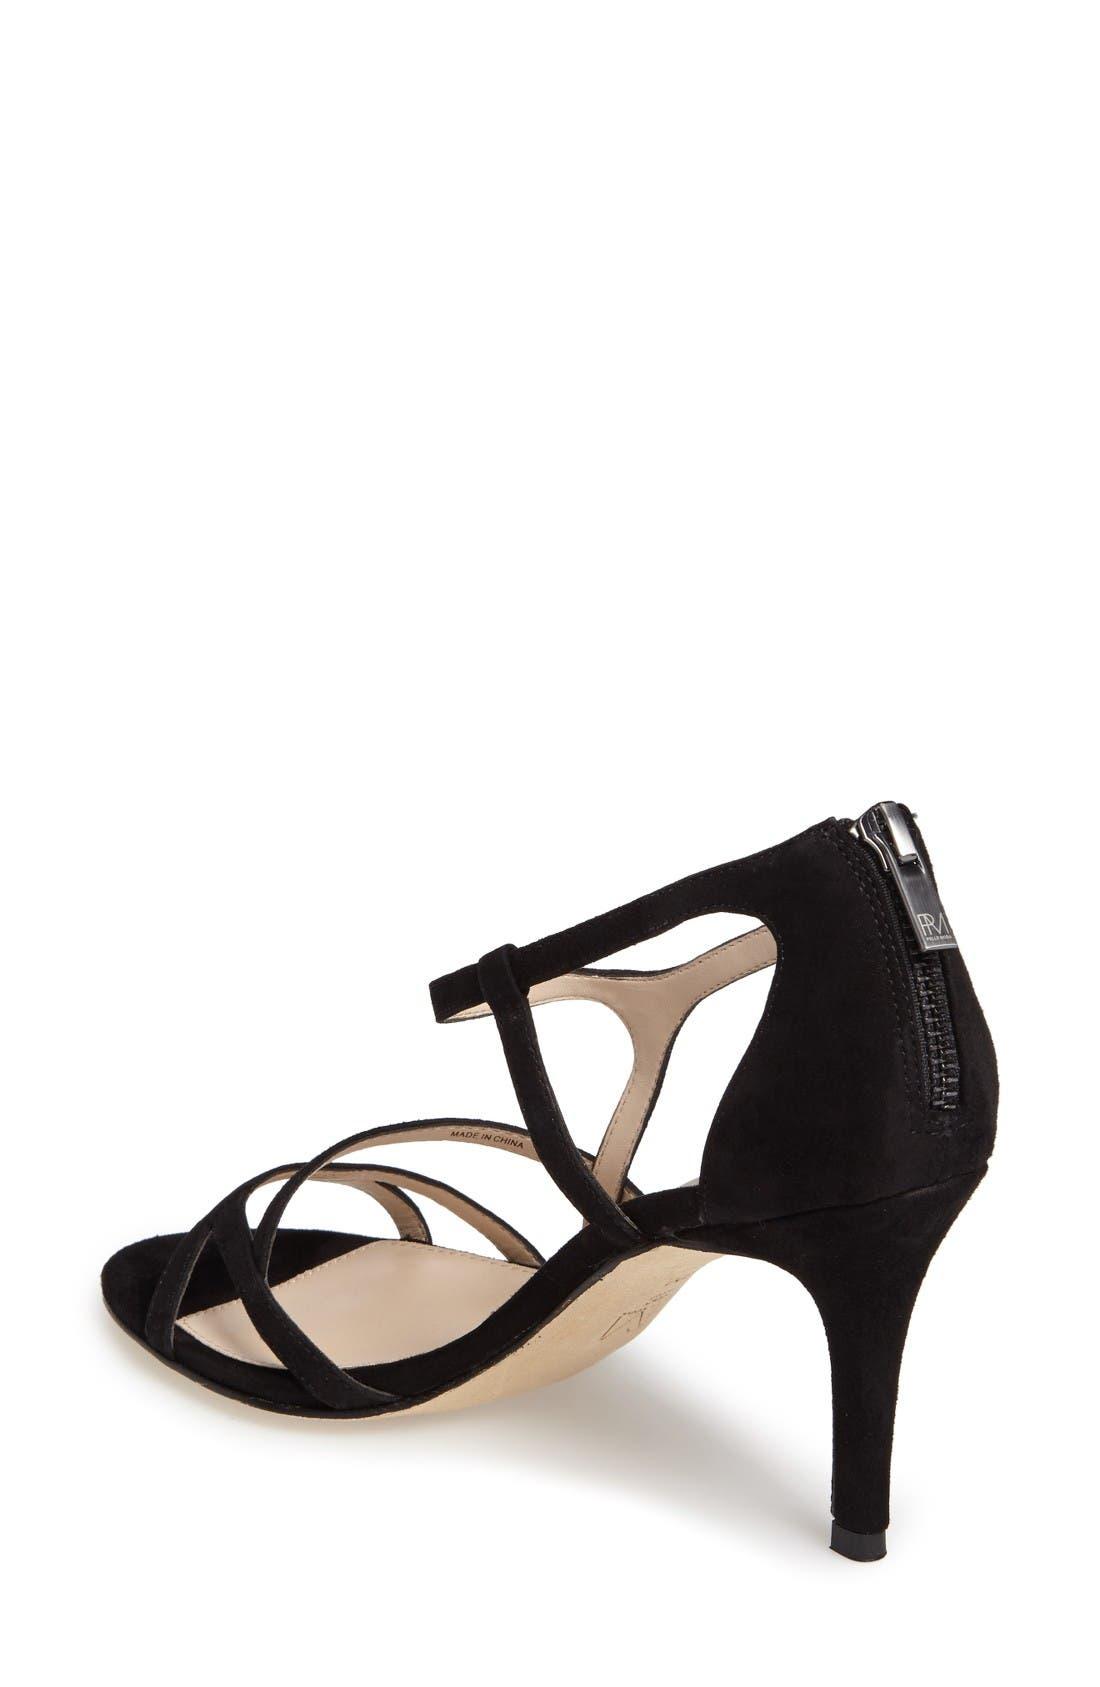 Ruby Asymmetrical Strappy Sandal,                             Alternate thumbnail 2, color,                             Black Leather